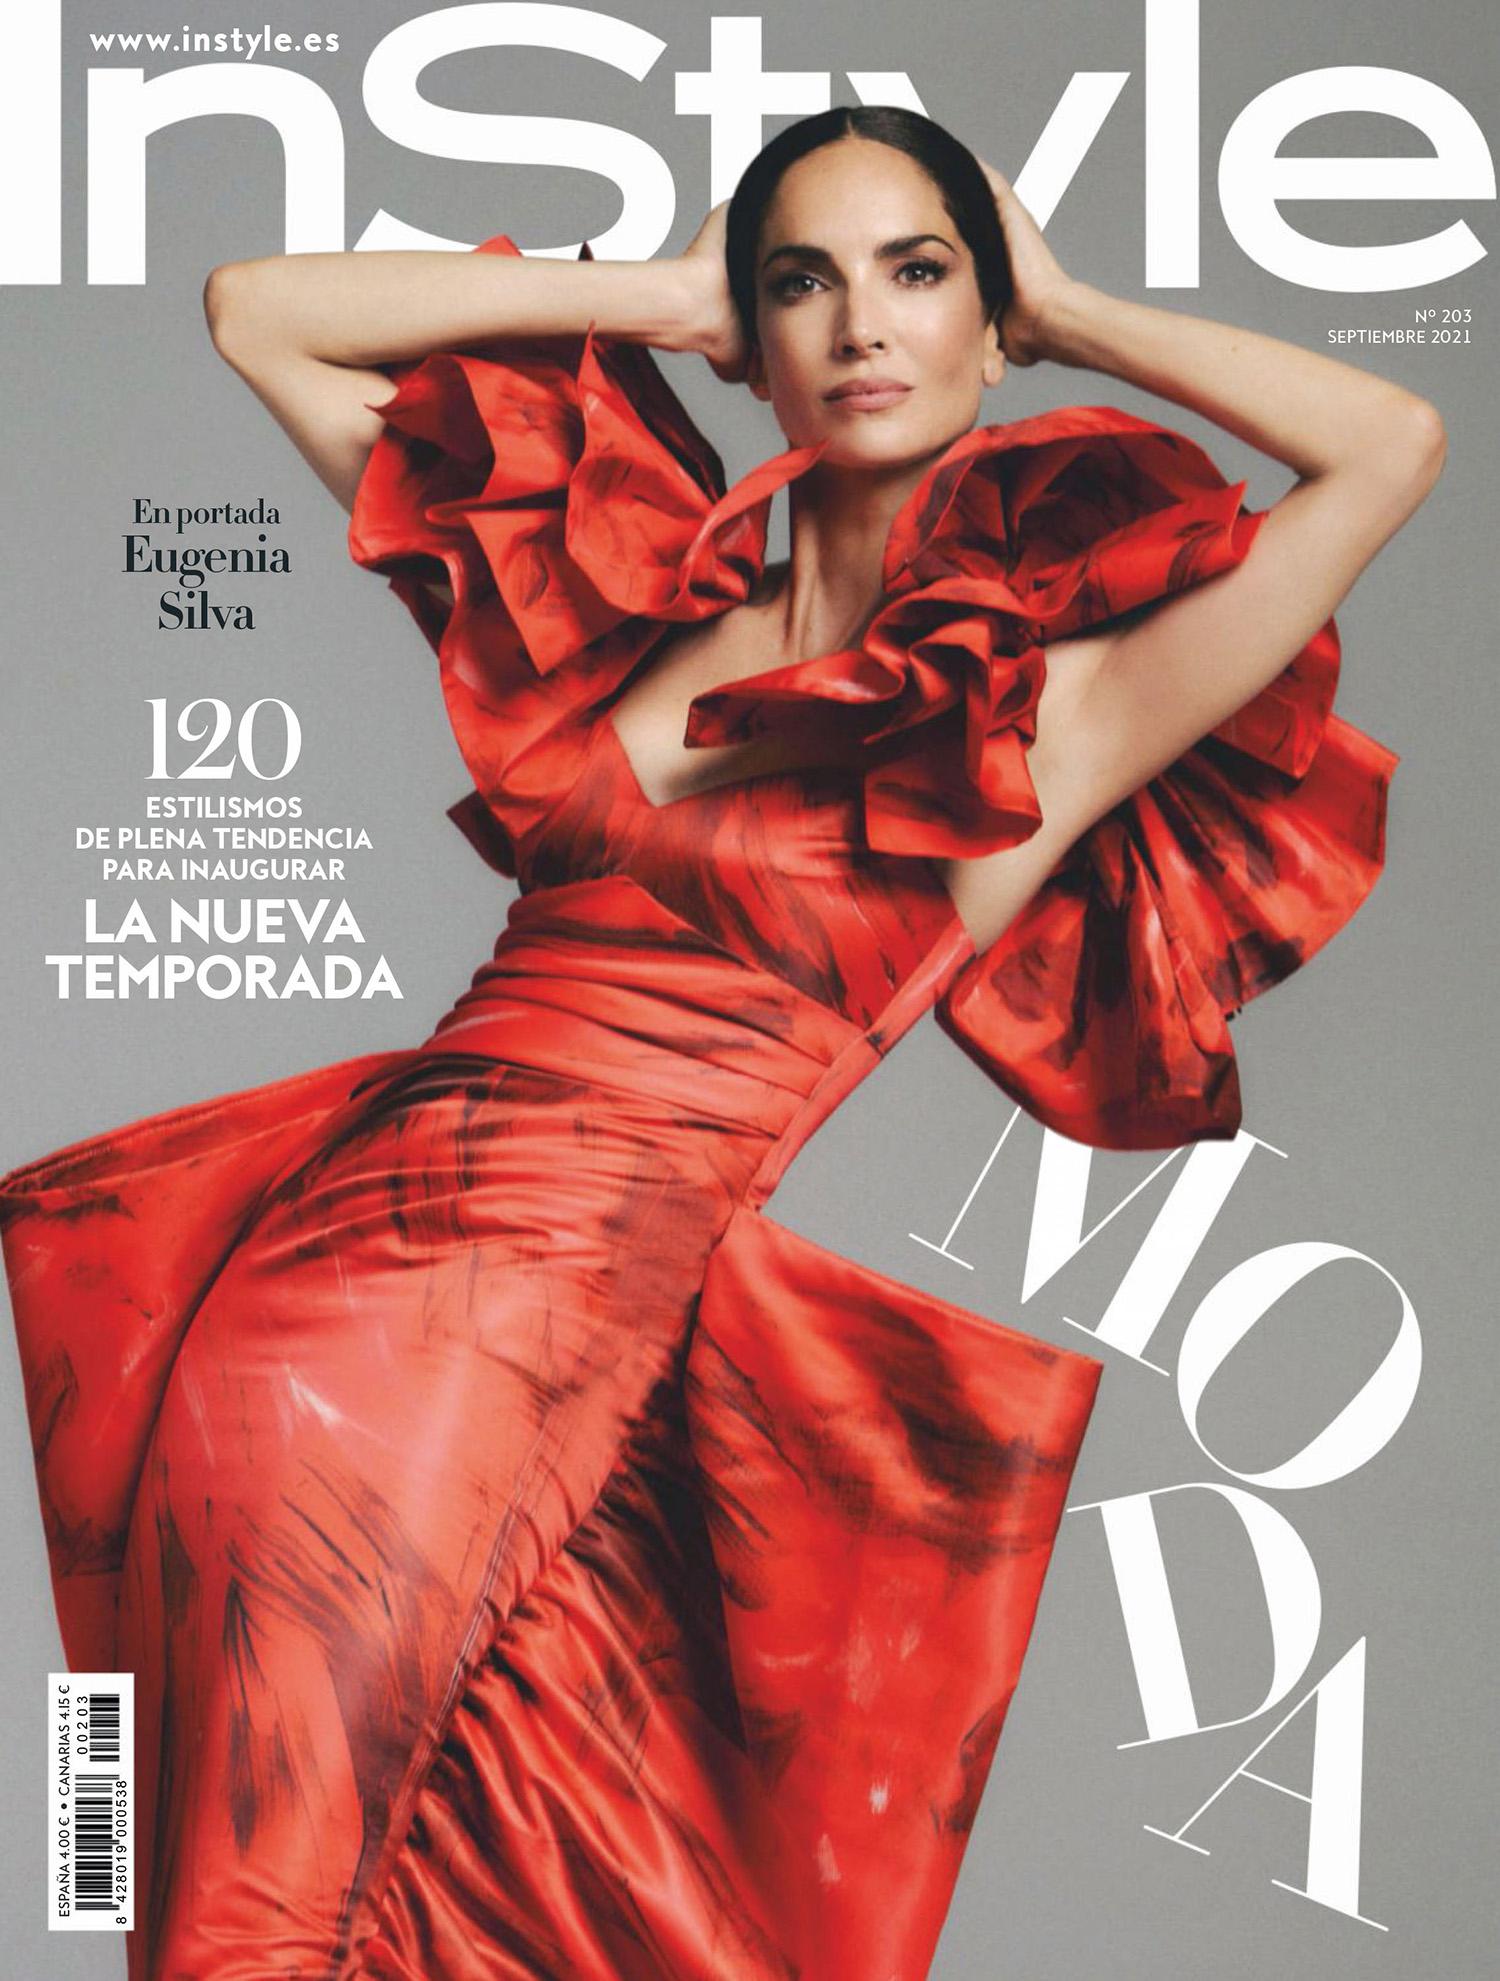 Eugenia Silva covers InStyle Spain September 2021 by Javier Biosca